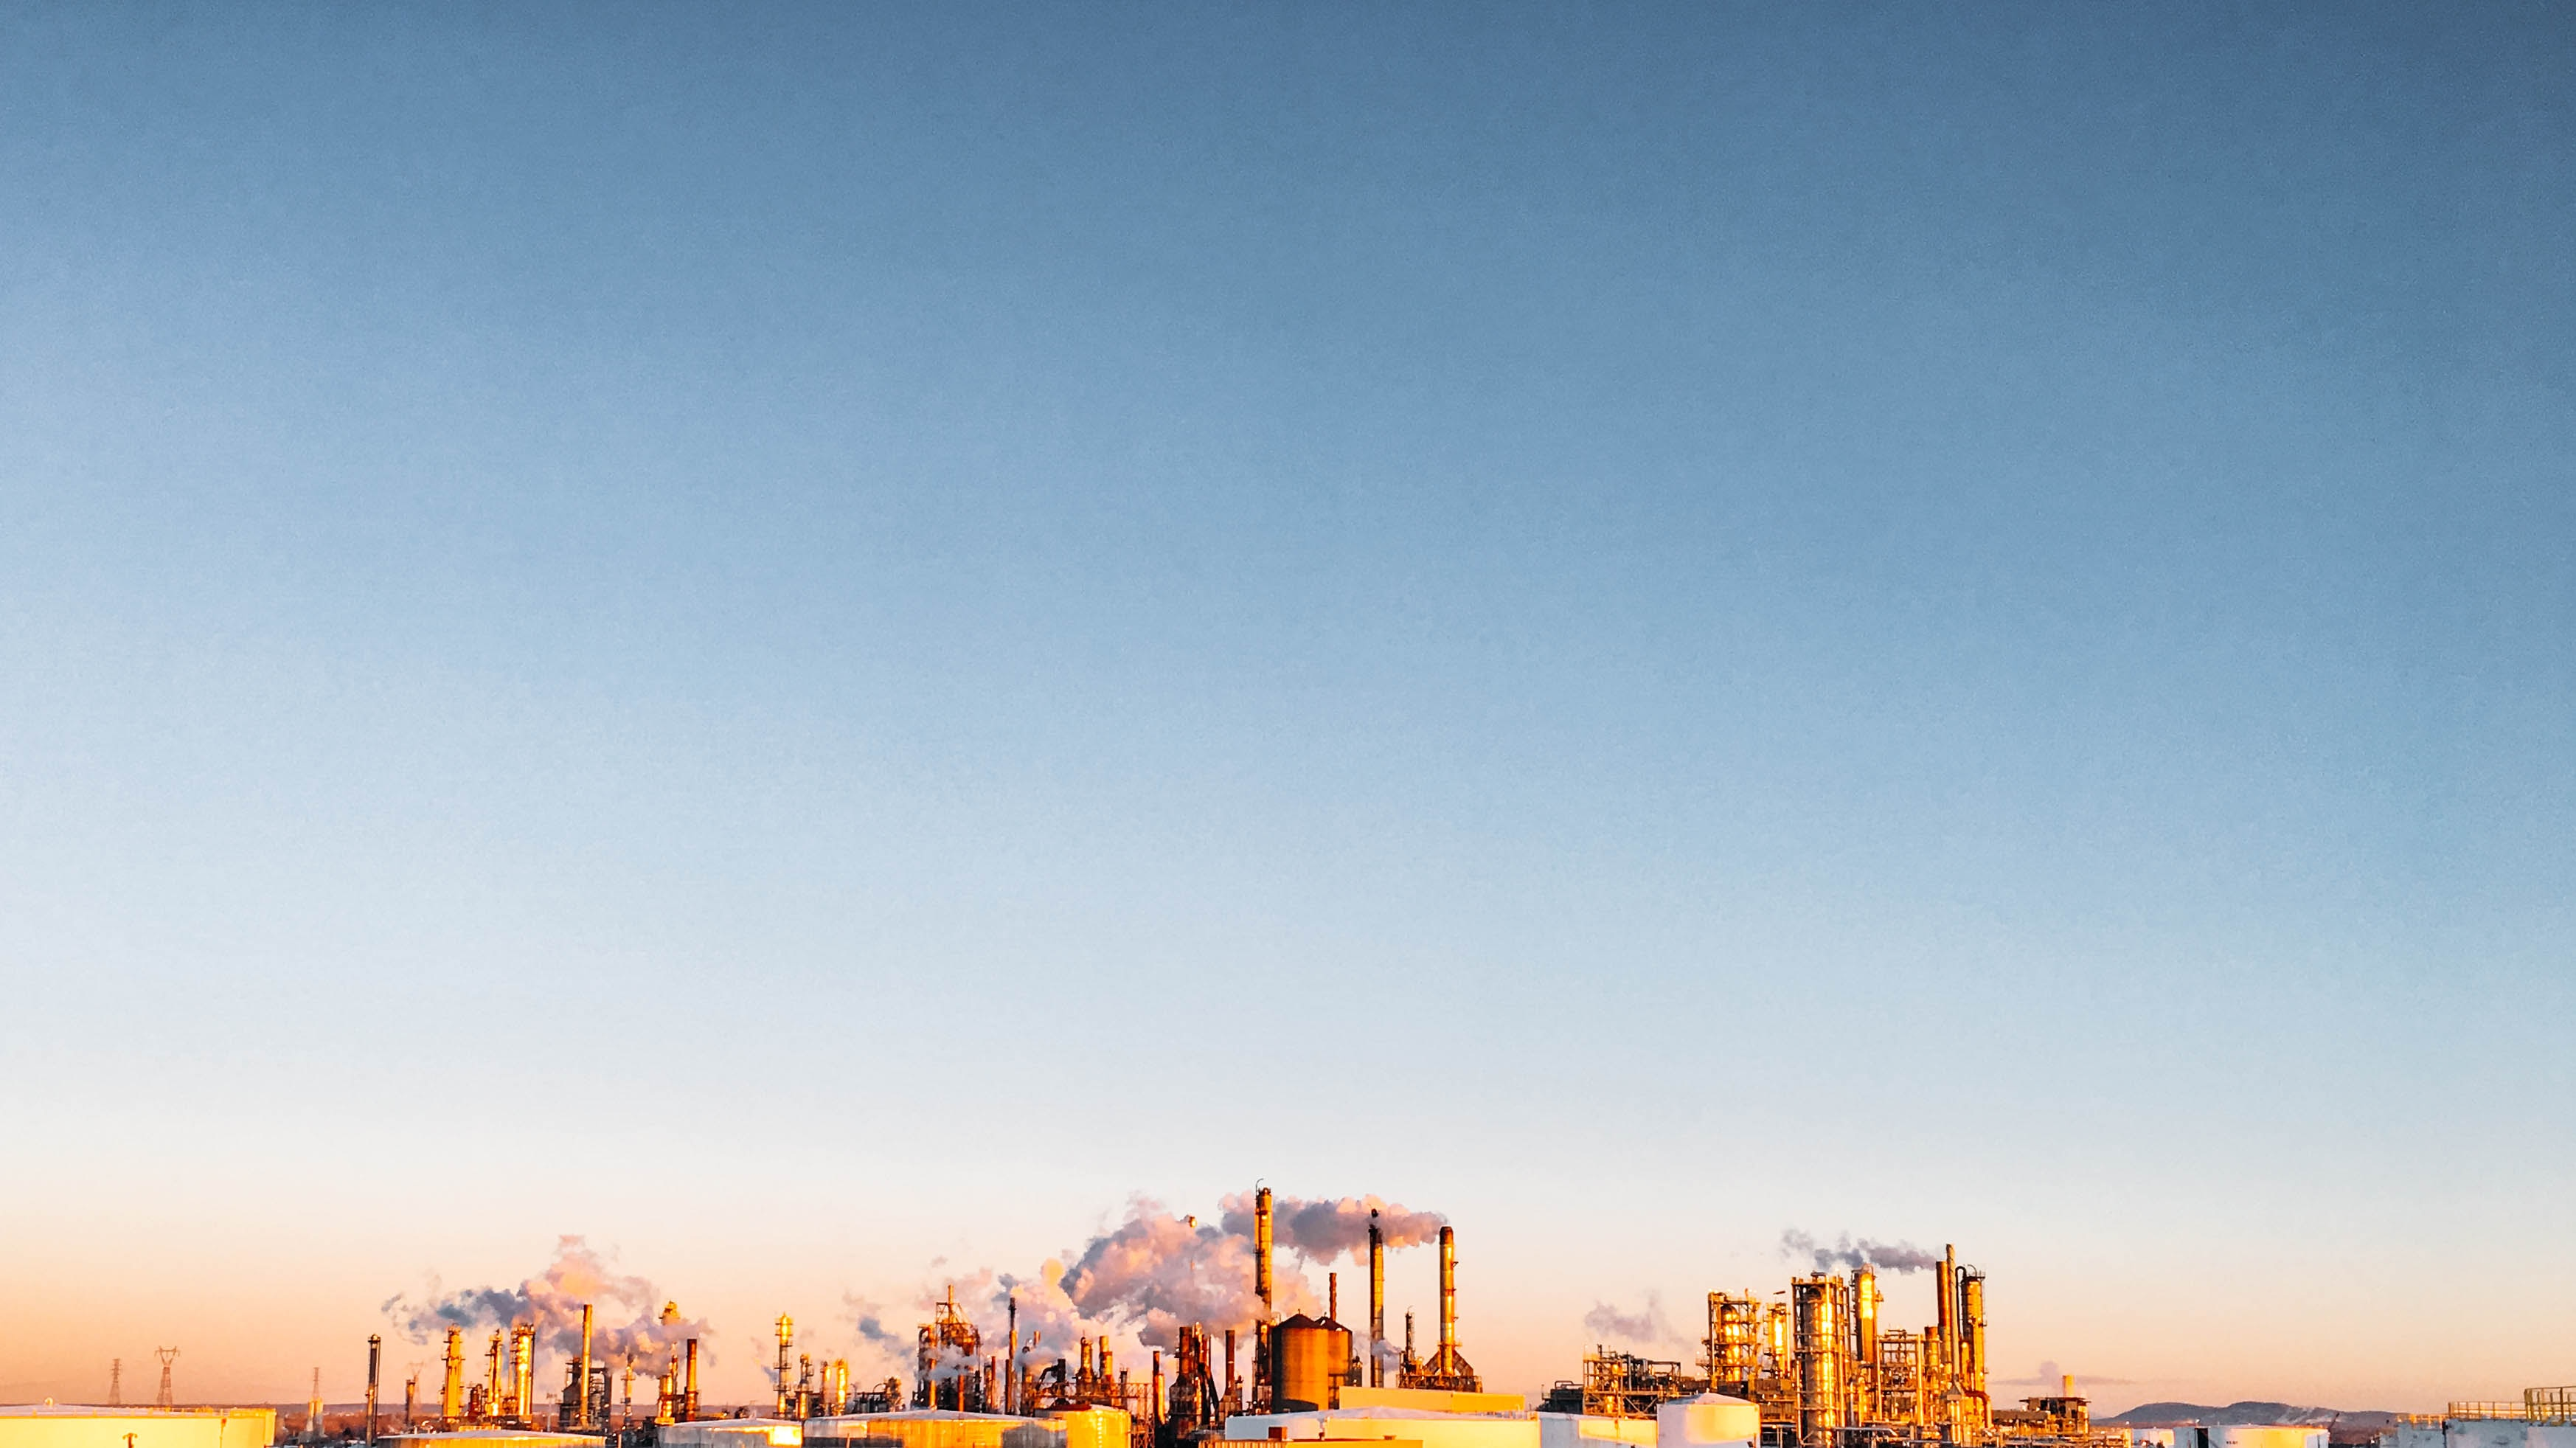 Oil Refinery Over Landscape